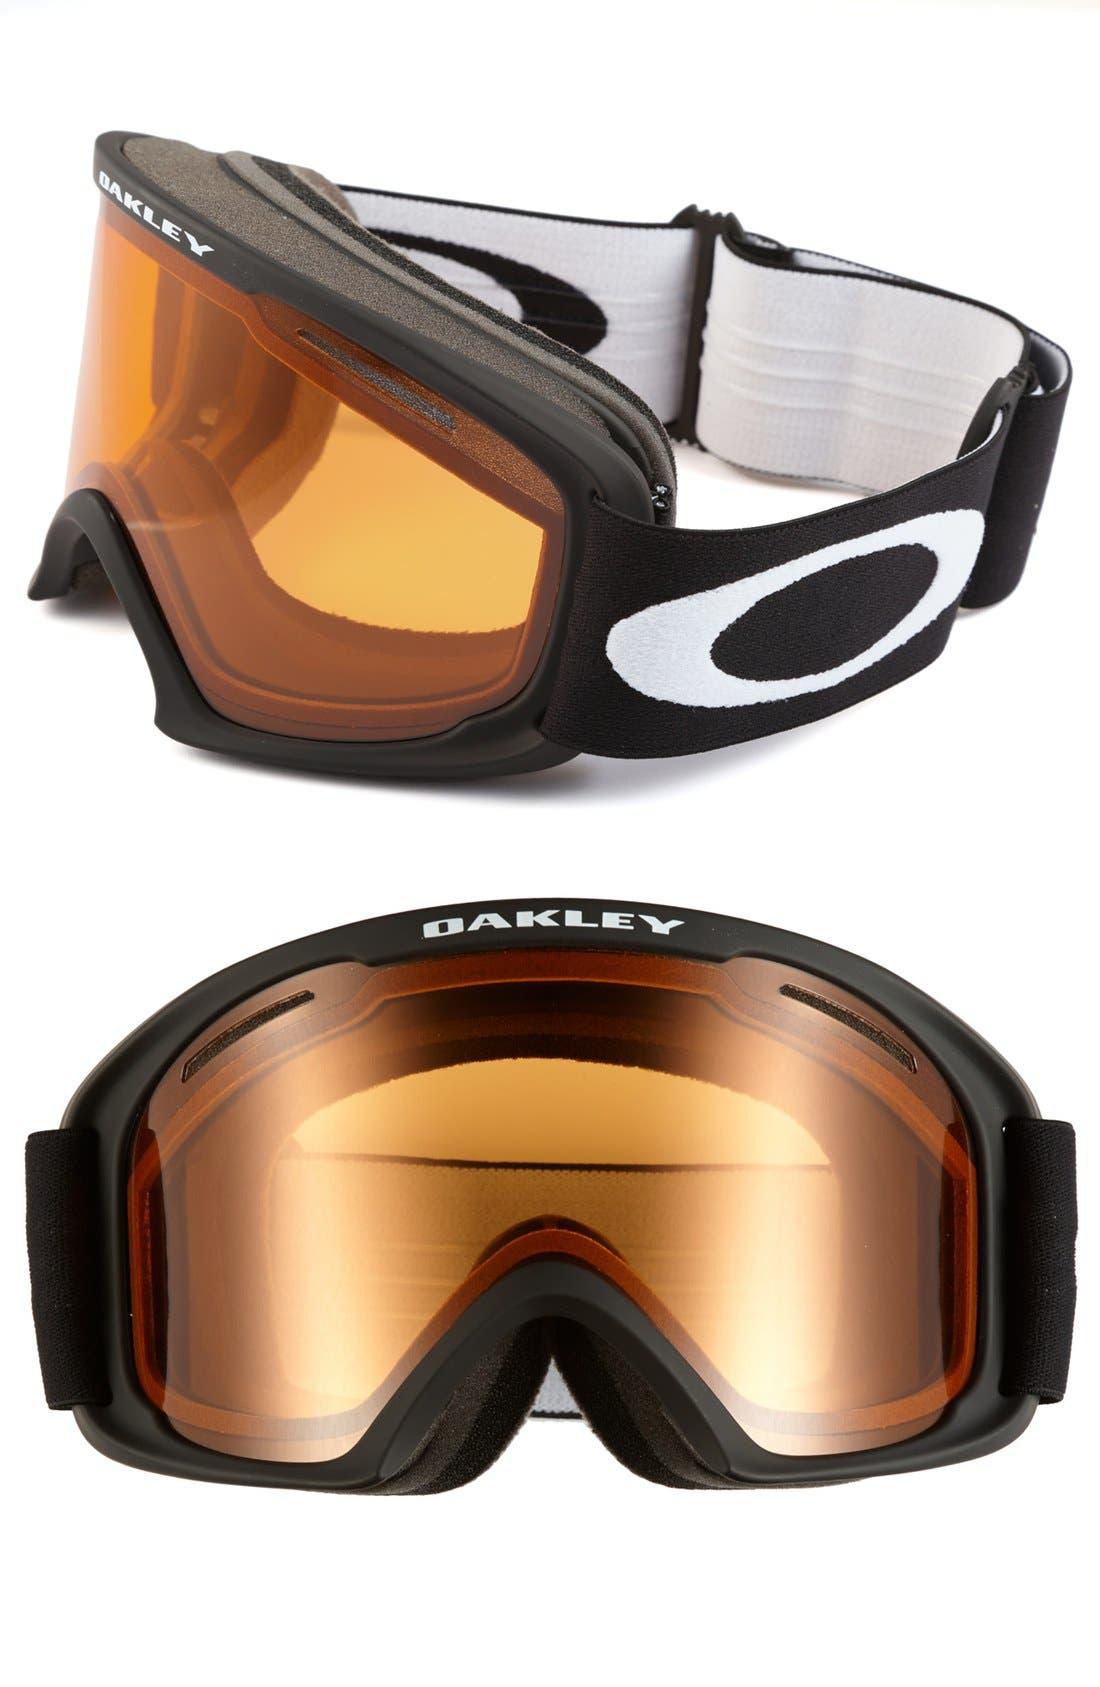 Main Image - Oakley 'O2 XL' Snow Goggles (Youth)